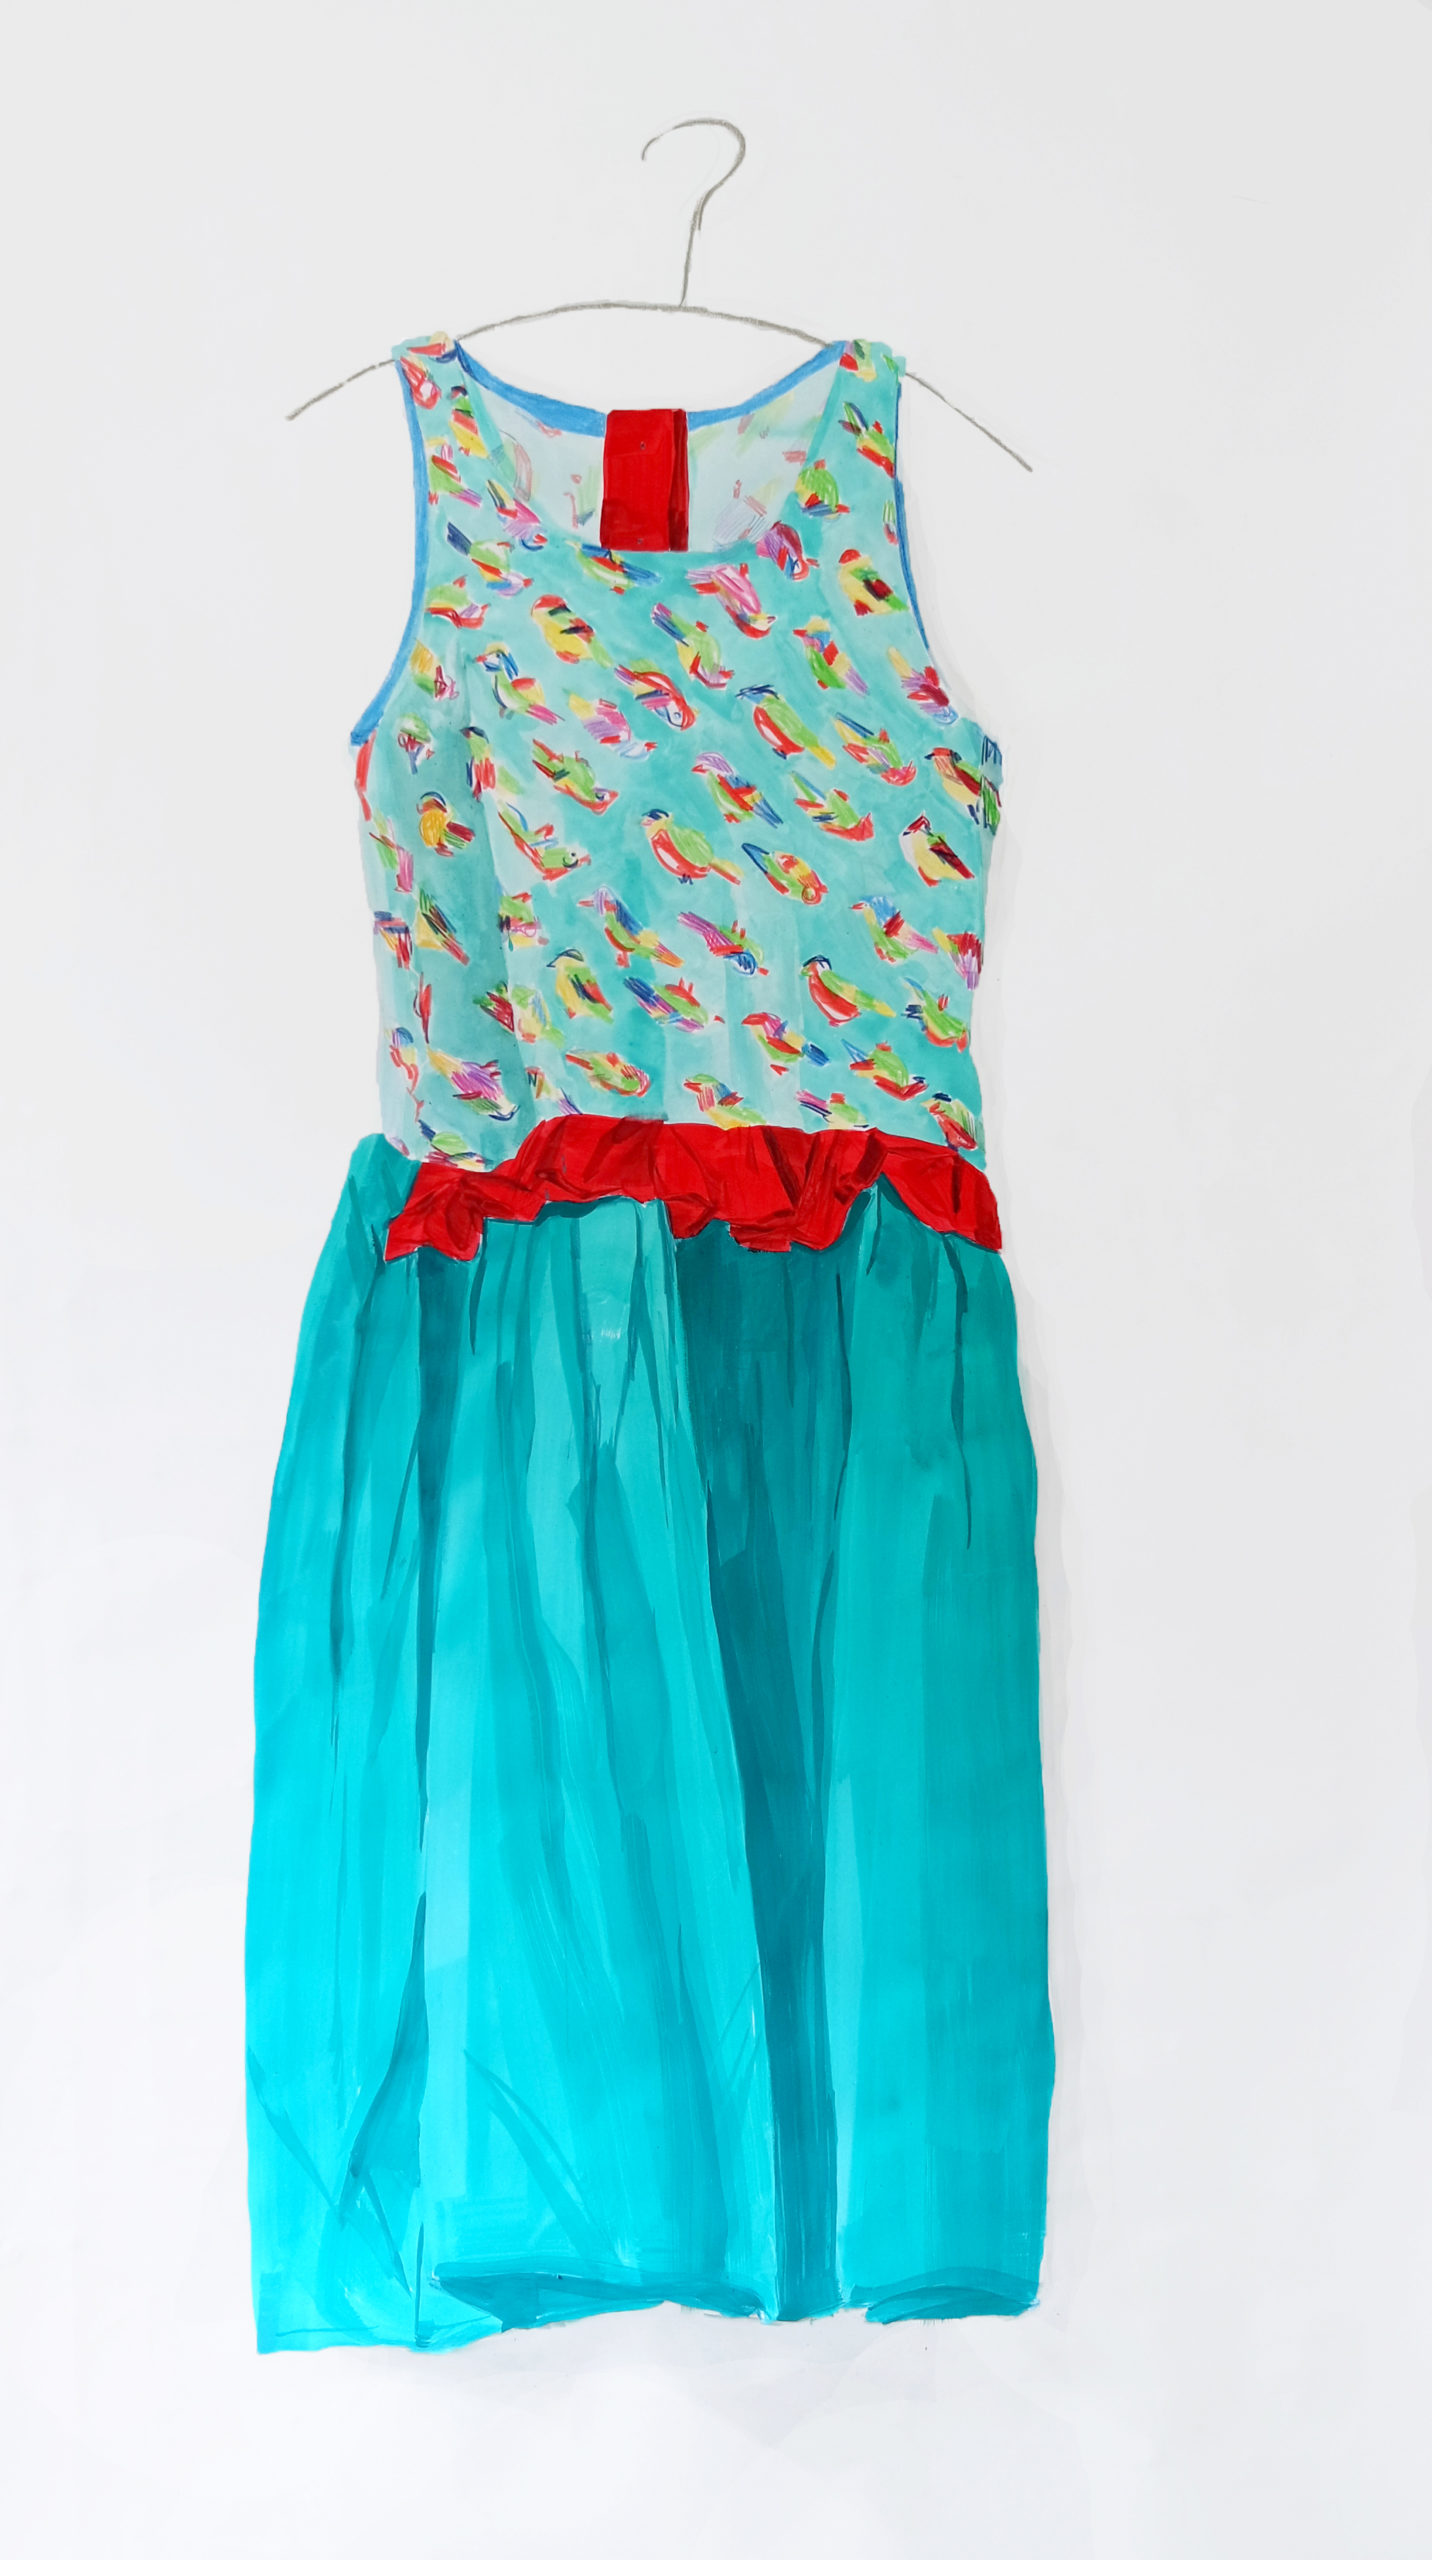 Britt Dorenbosch Mijn kleurenleer kinderkleding jurk turqoise